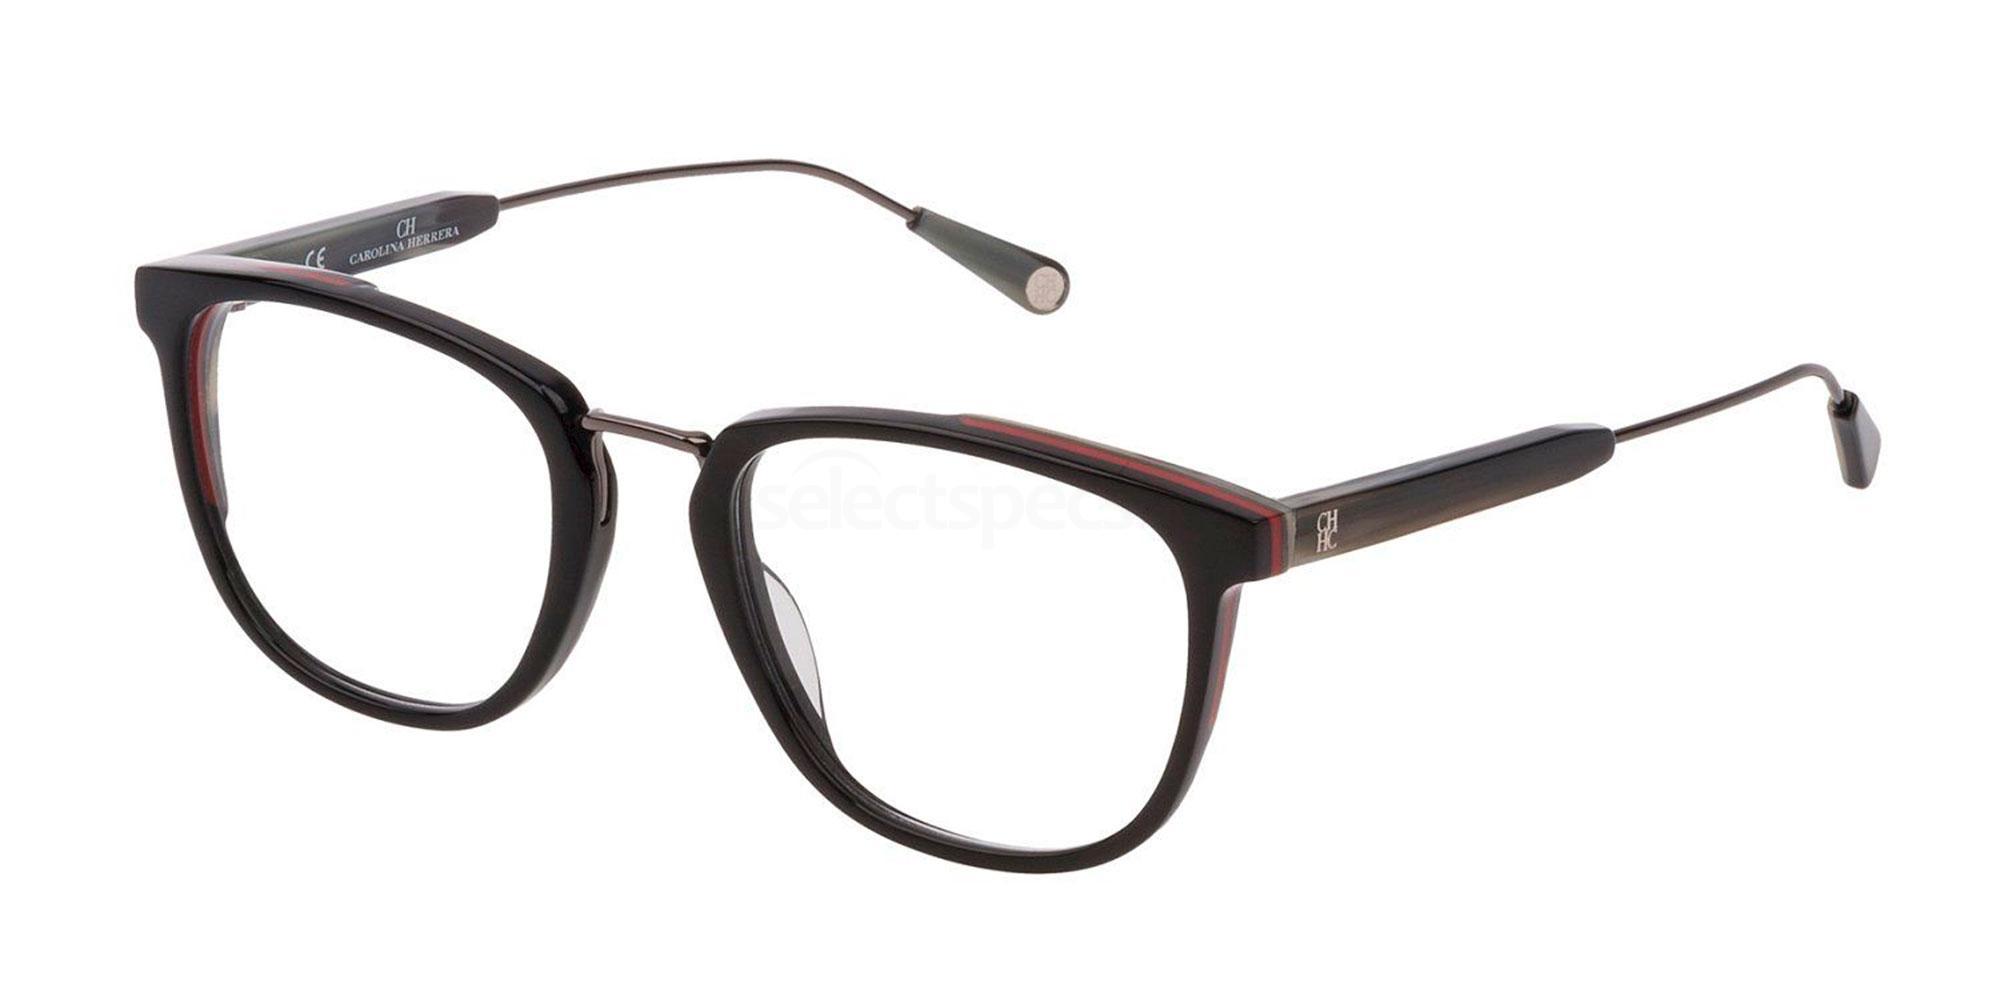 09H7 VHE812 Glasses, CH Carolina Herrera